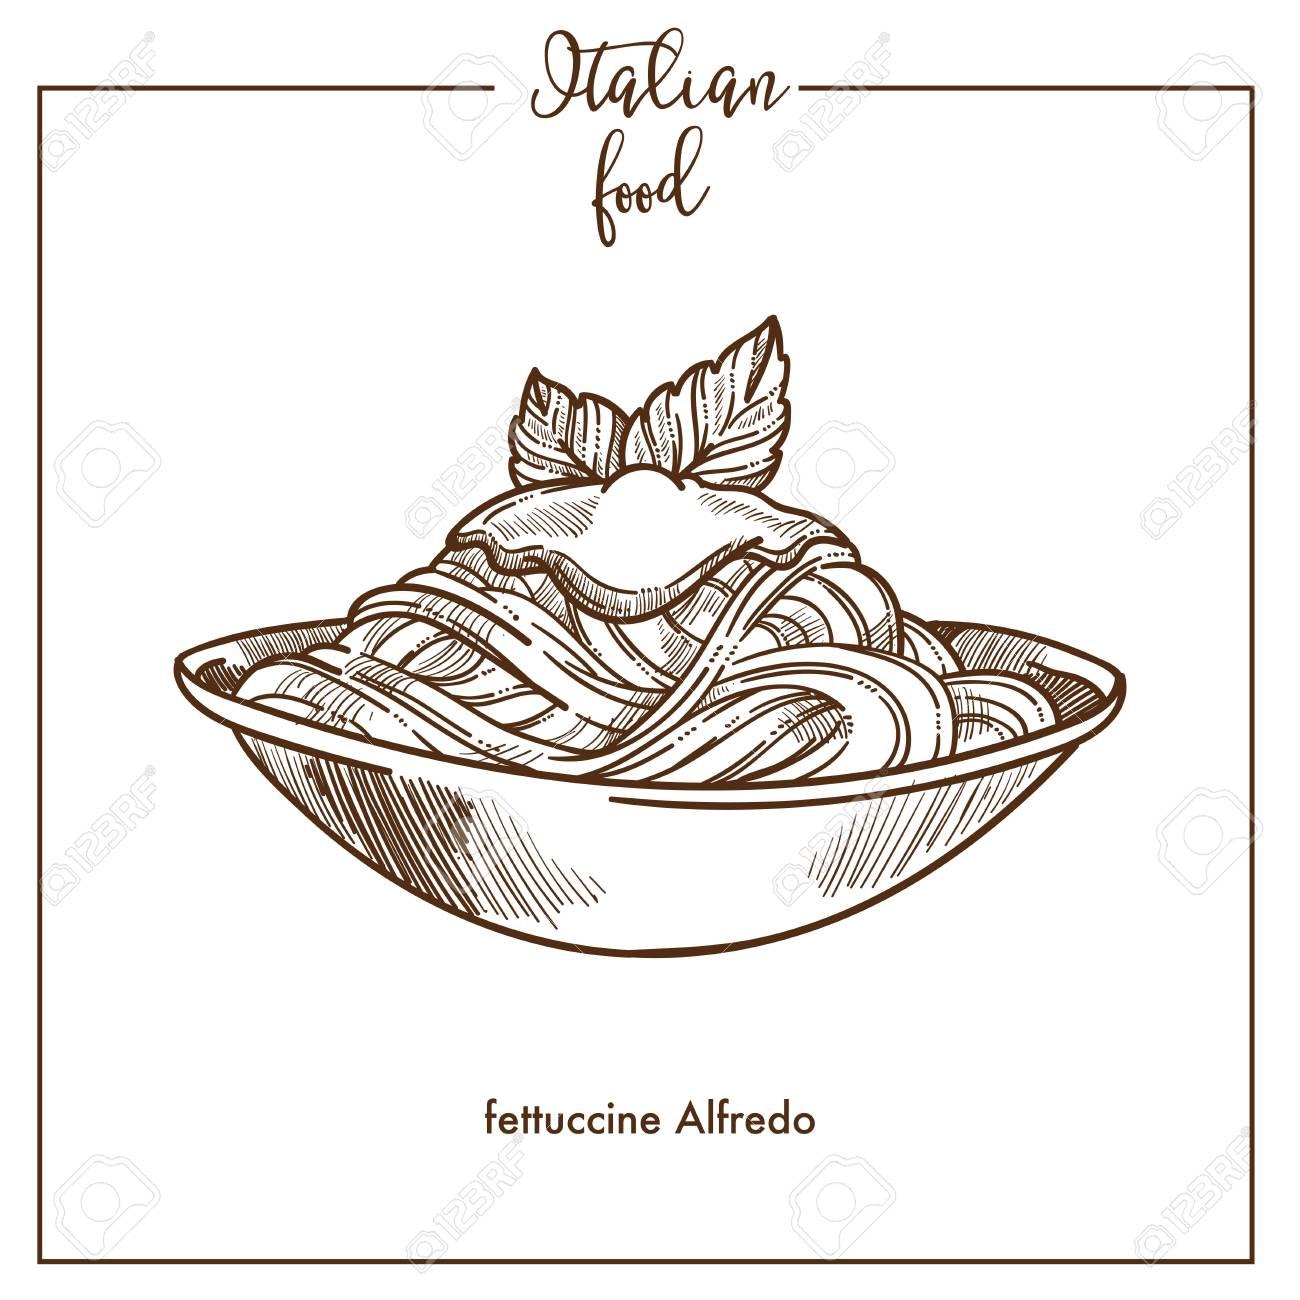 Fettuccine Alfredo pasta sketch vector icon for Italian cuisine food menu  design Stock Vector , 95578008